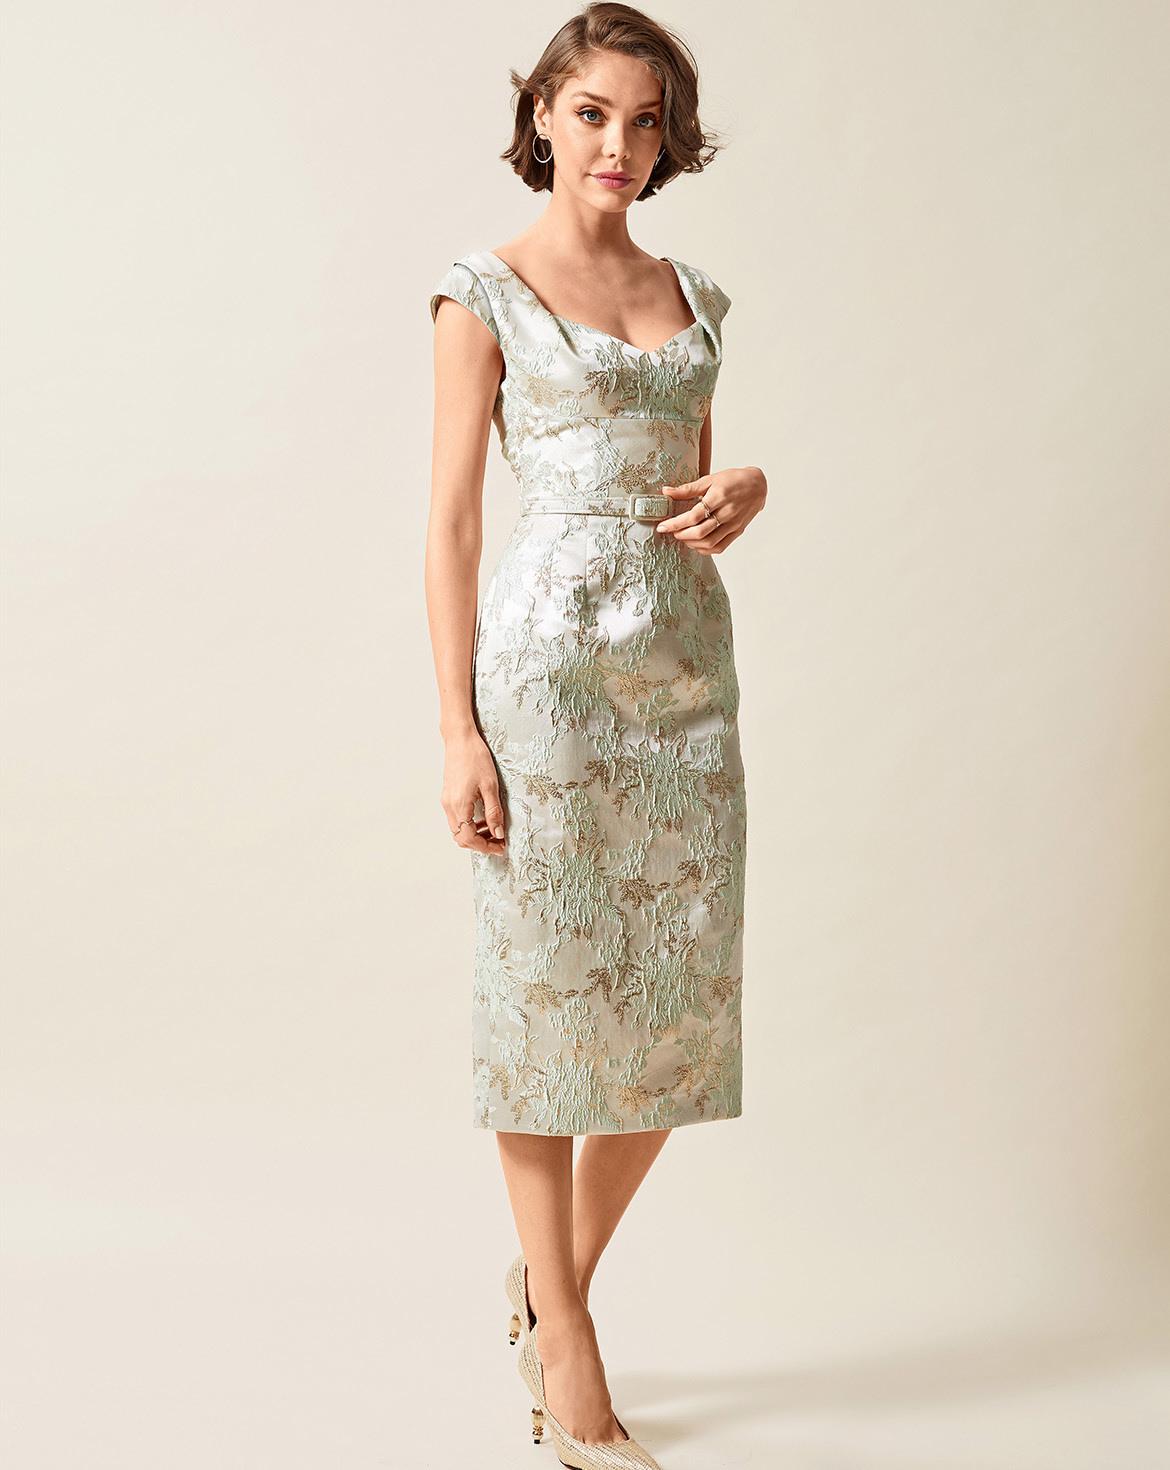 20 Genial Retro Abendkleid Galerie13 Elegant Retro Abendkleid Spezialgebiet